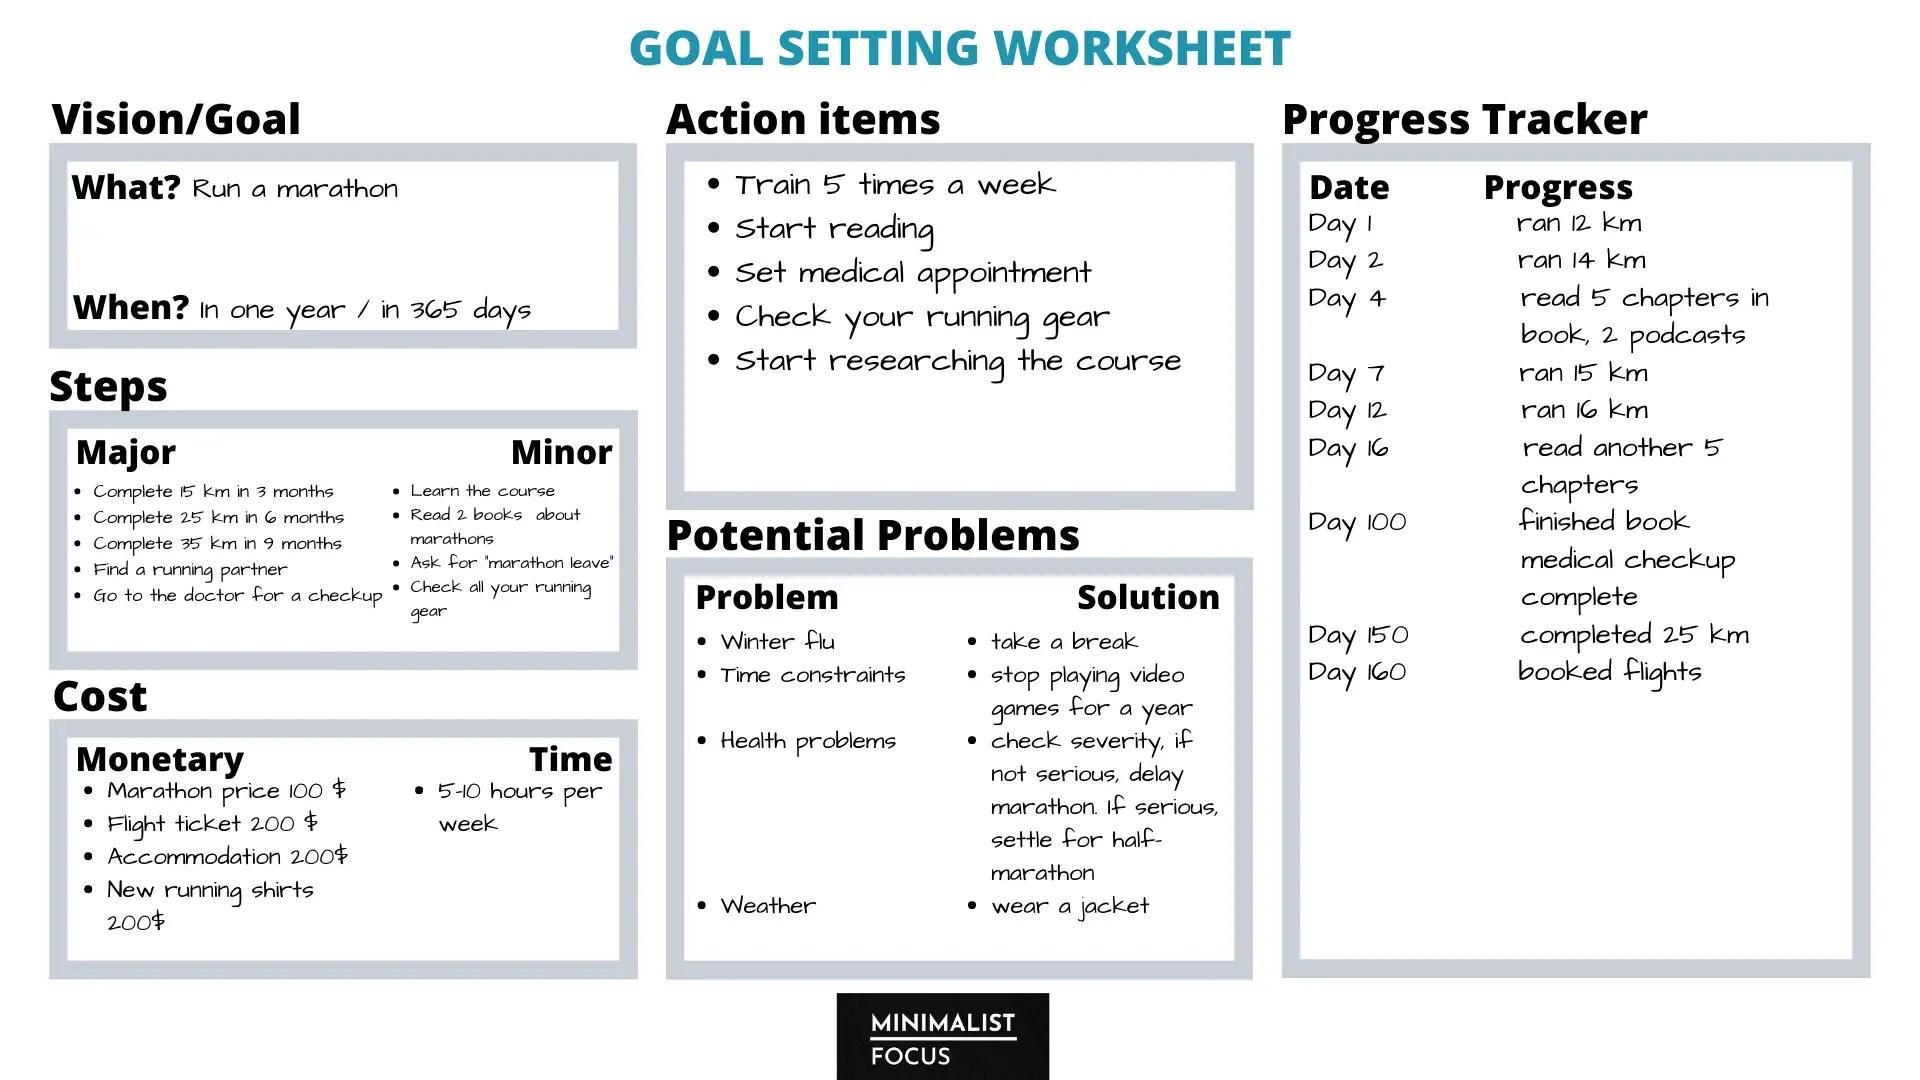 The Ultimate Goal Setting Worksheet